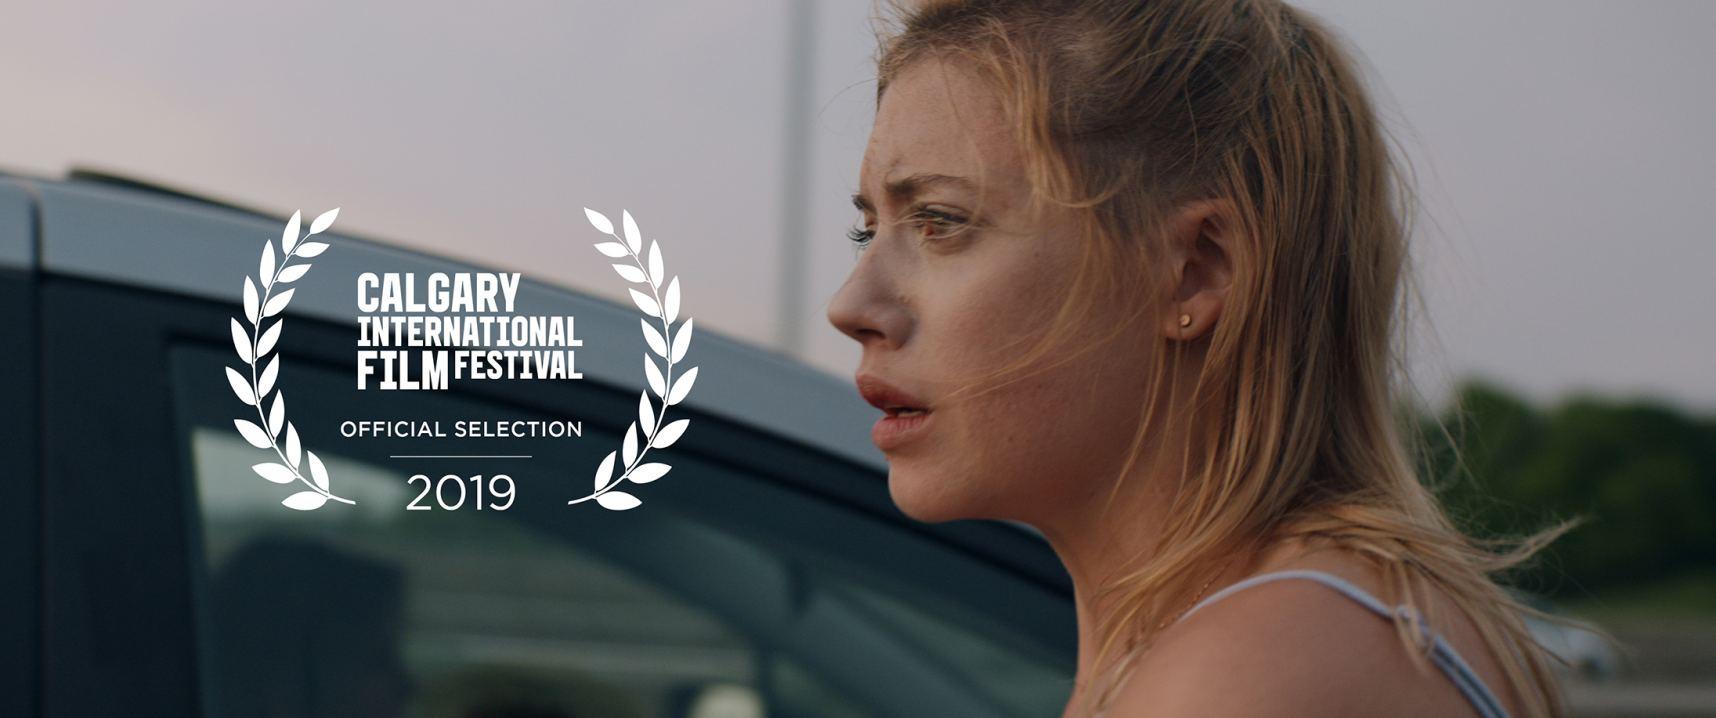 Official Selection 20th Calgary International Film Festival - Standstill (2019)